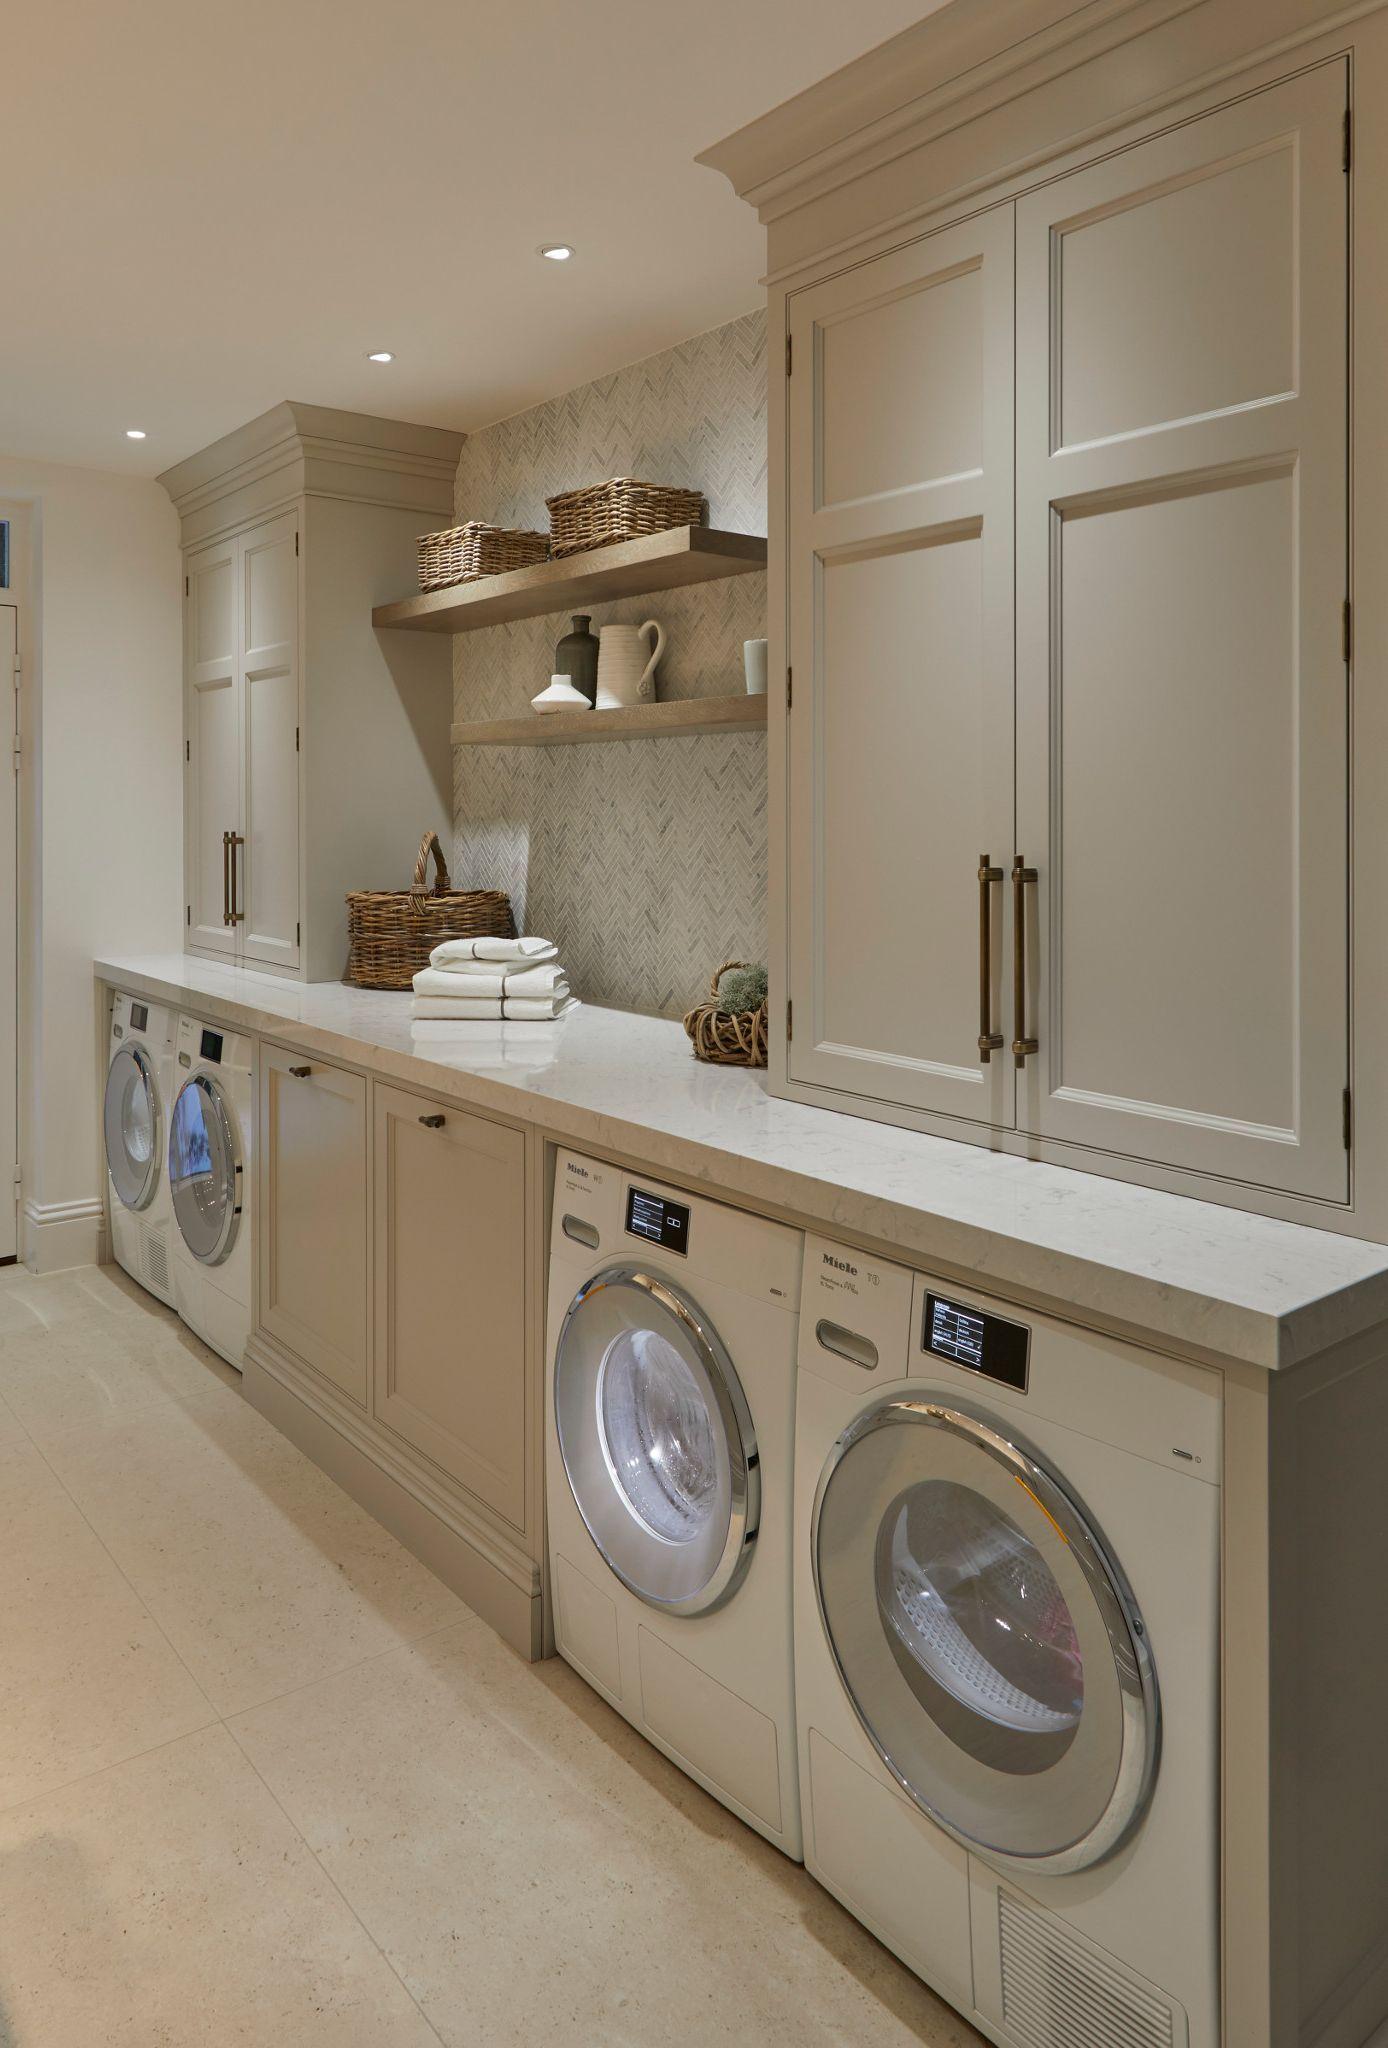 Refine Define Laundry Room Design Ideas Custom Laundry Room Laundry Room Design Laundry Room Remodel